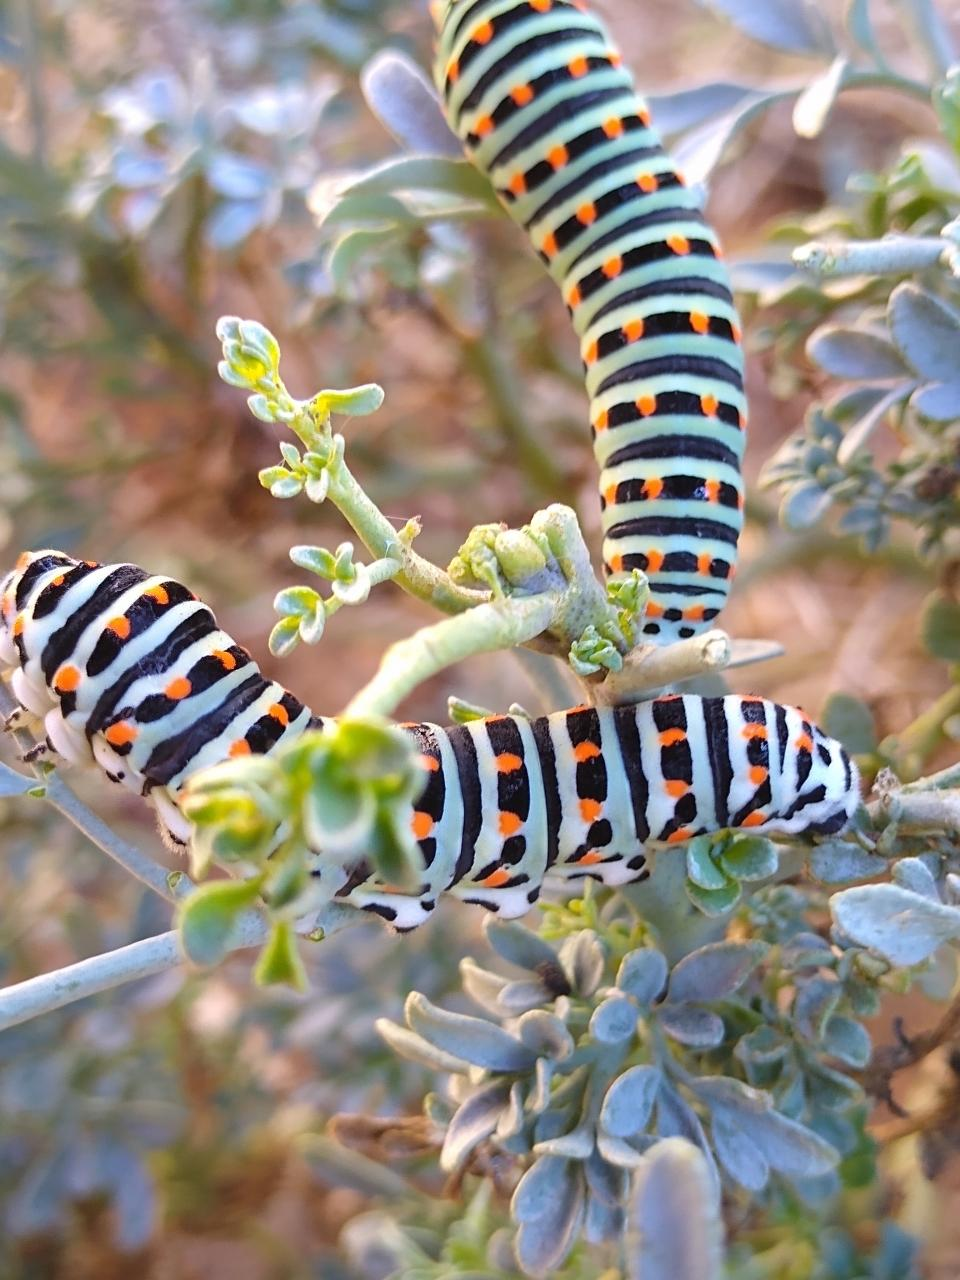 Swallow Tail Caterpillars